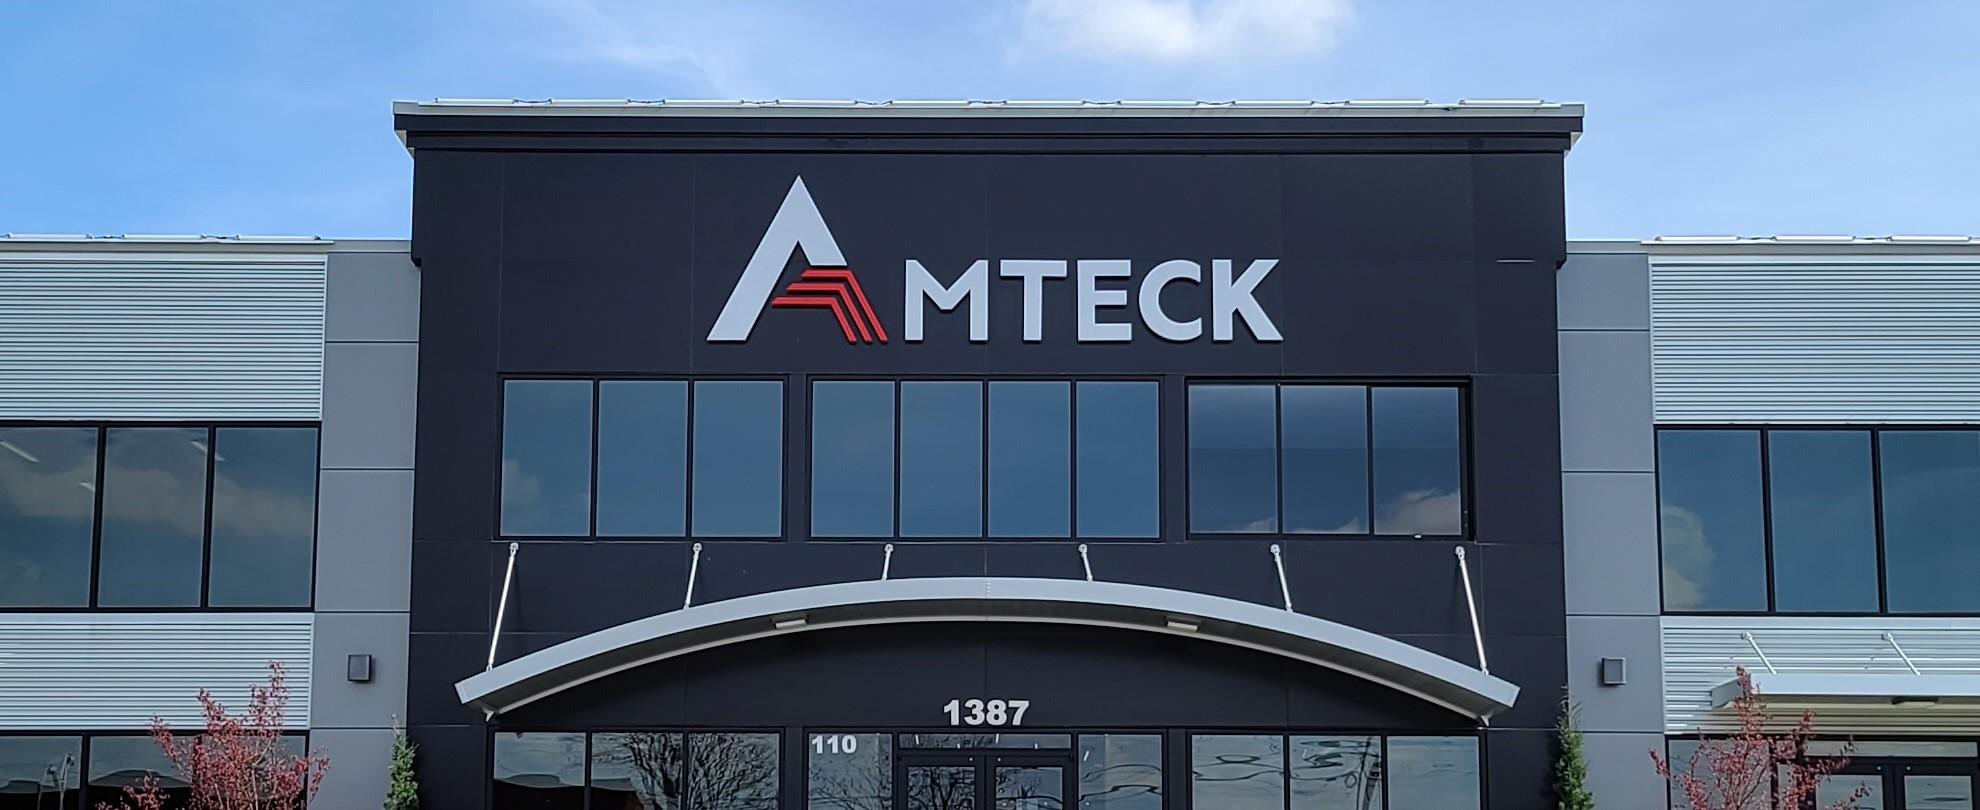 Amteck Headquarters Building